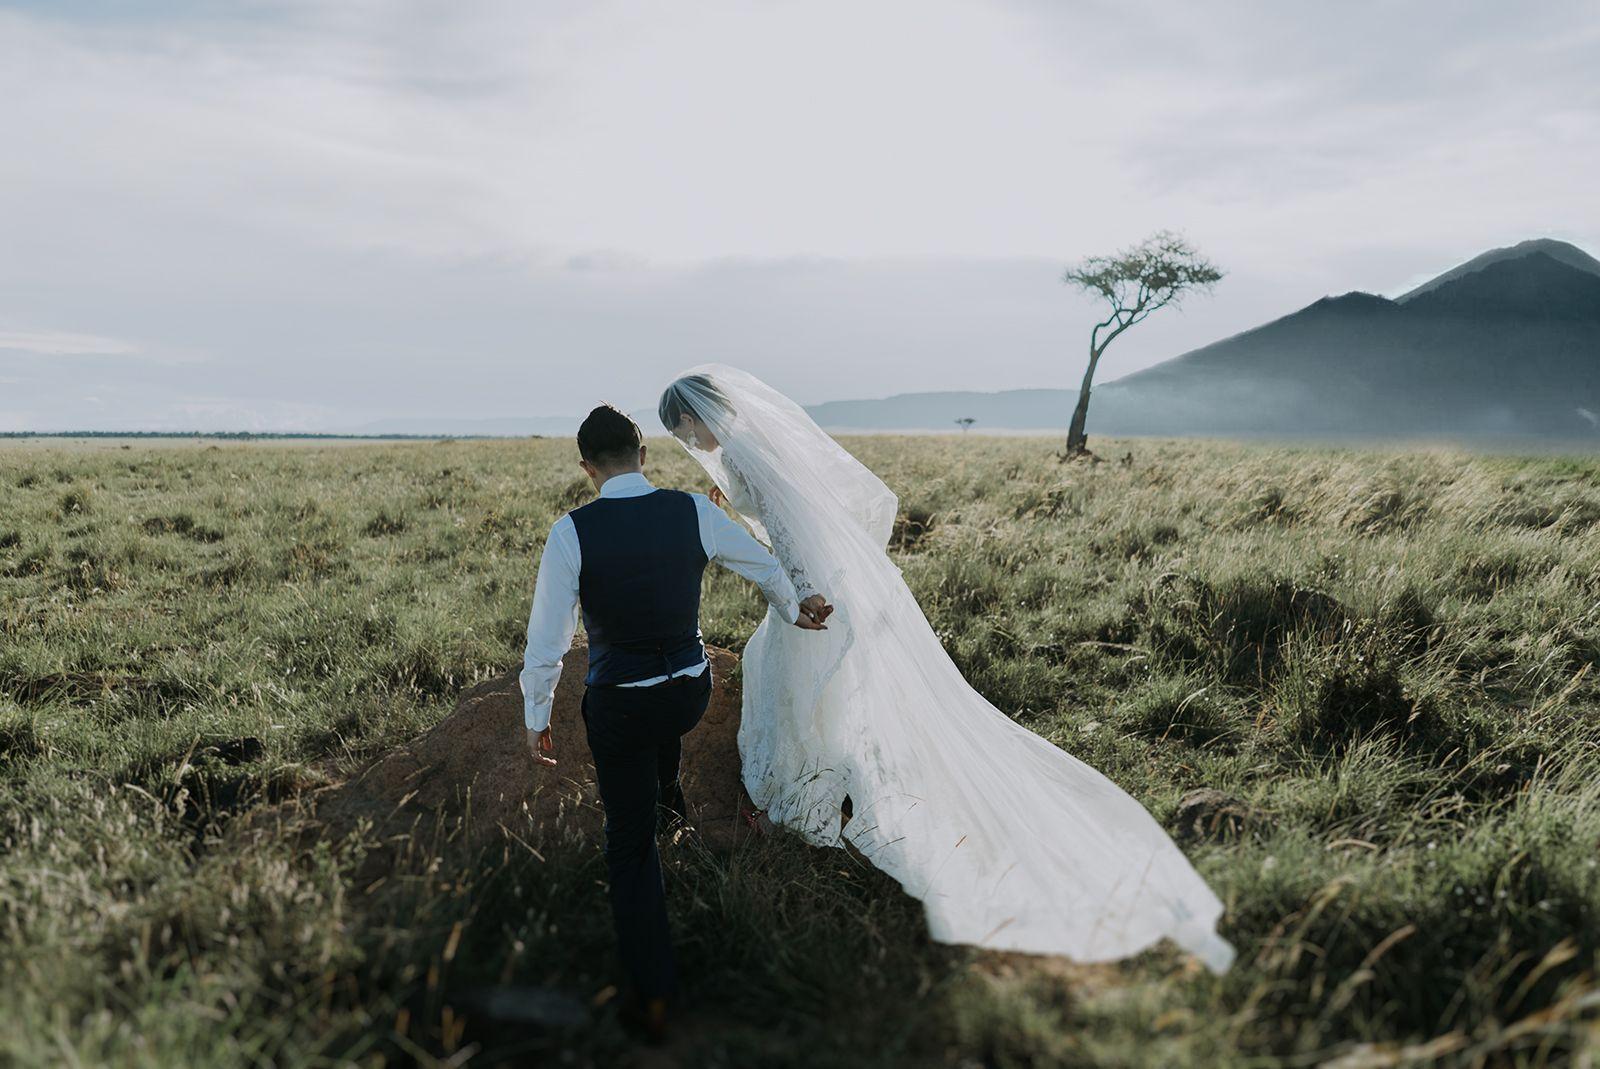 Elopement in Masai Mara, Kenya / Kenya Wedding Photographer / Kenya Wedding Film